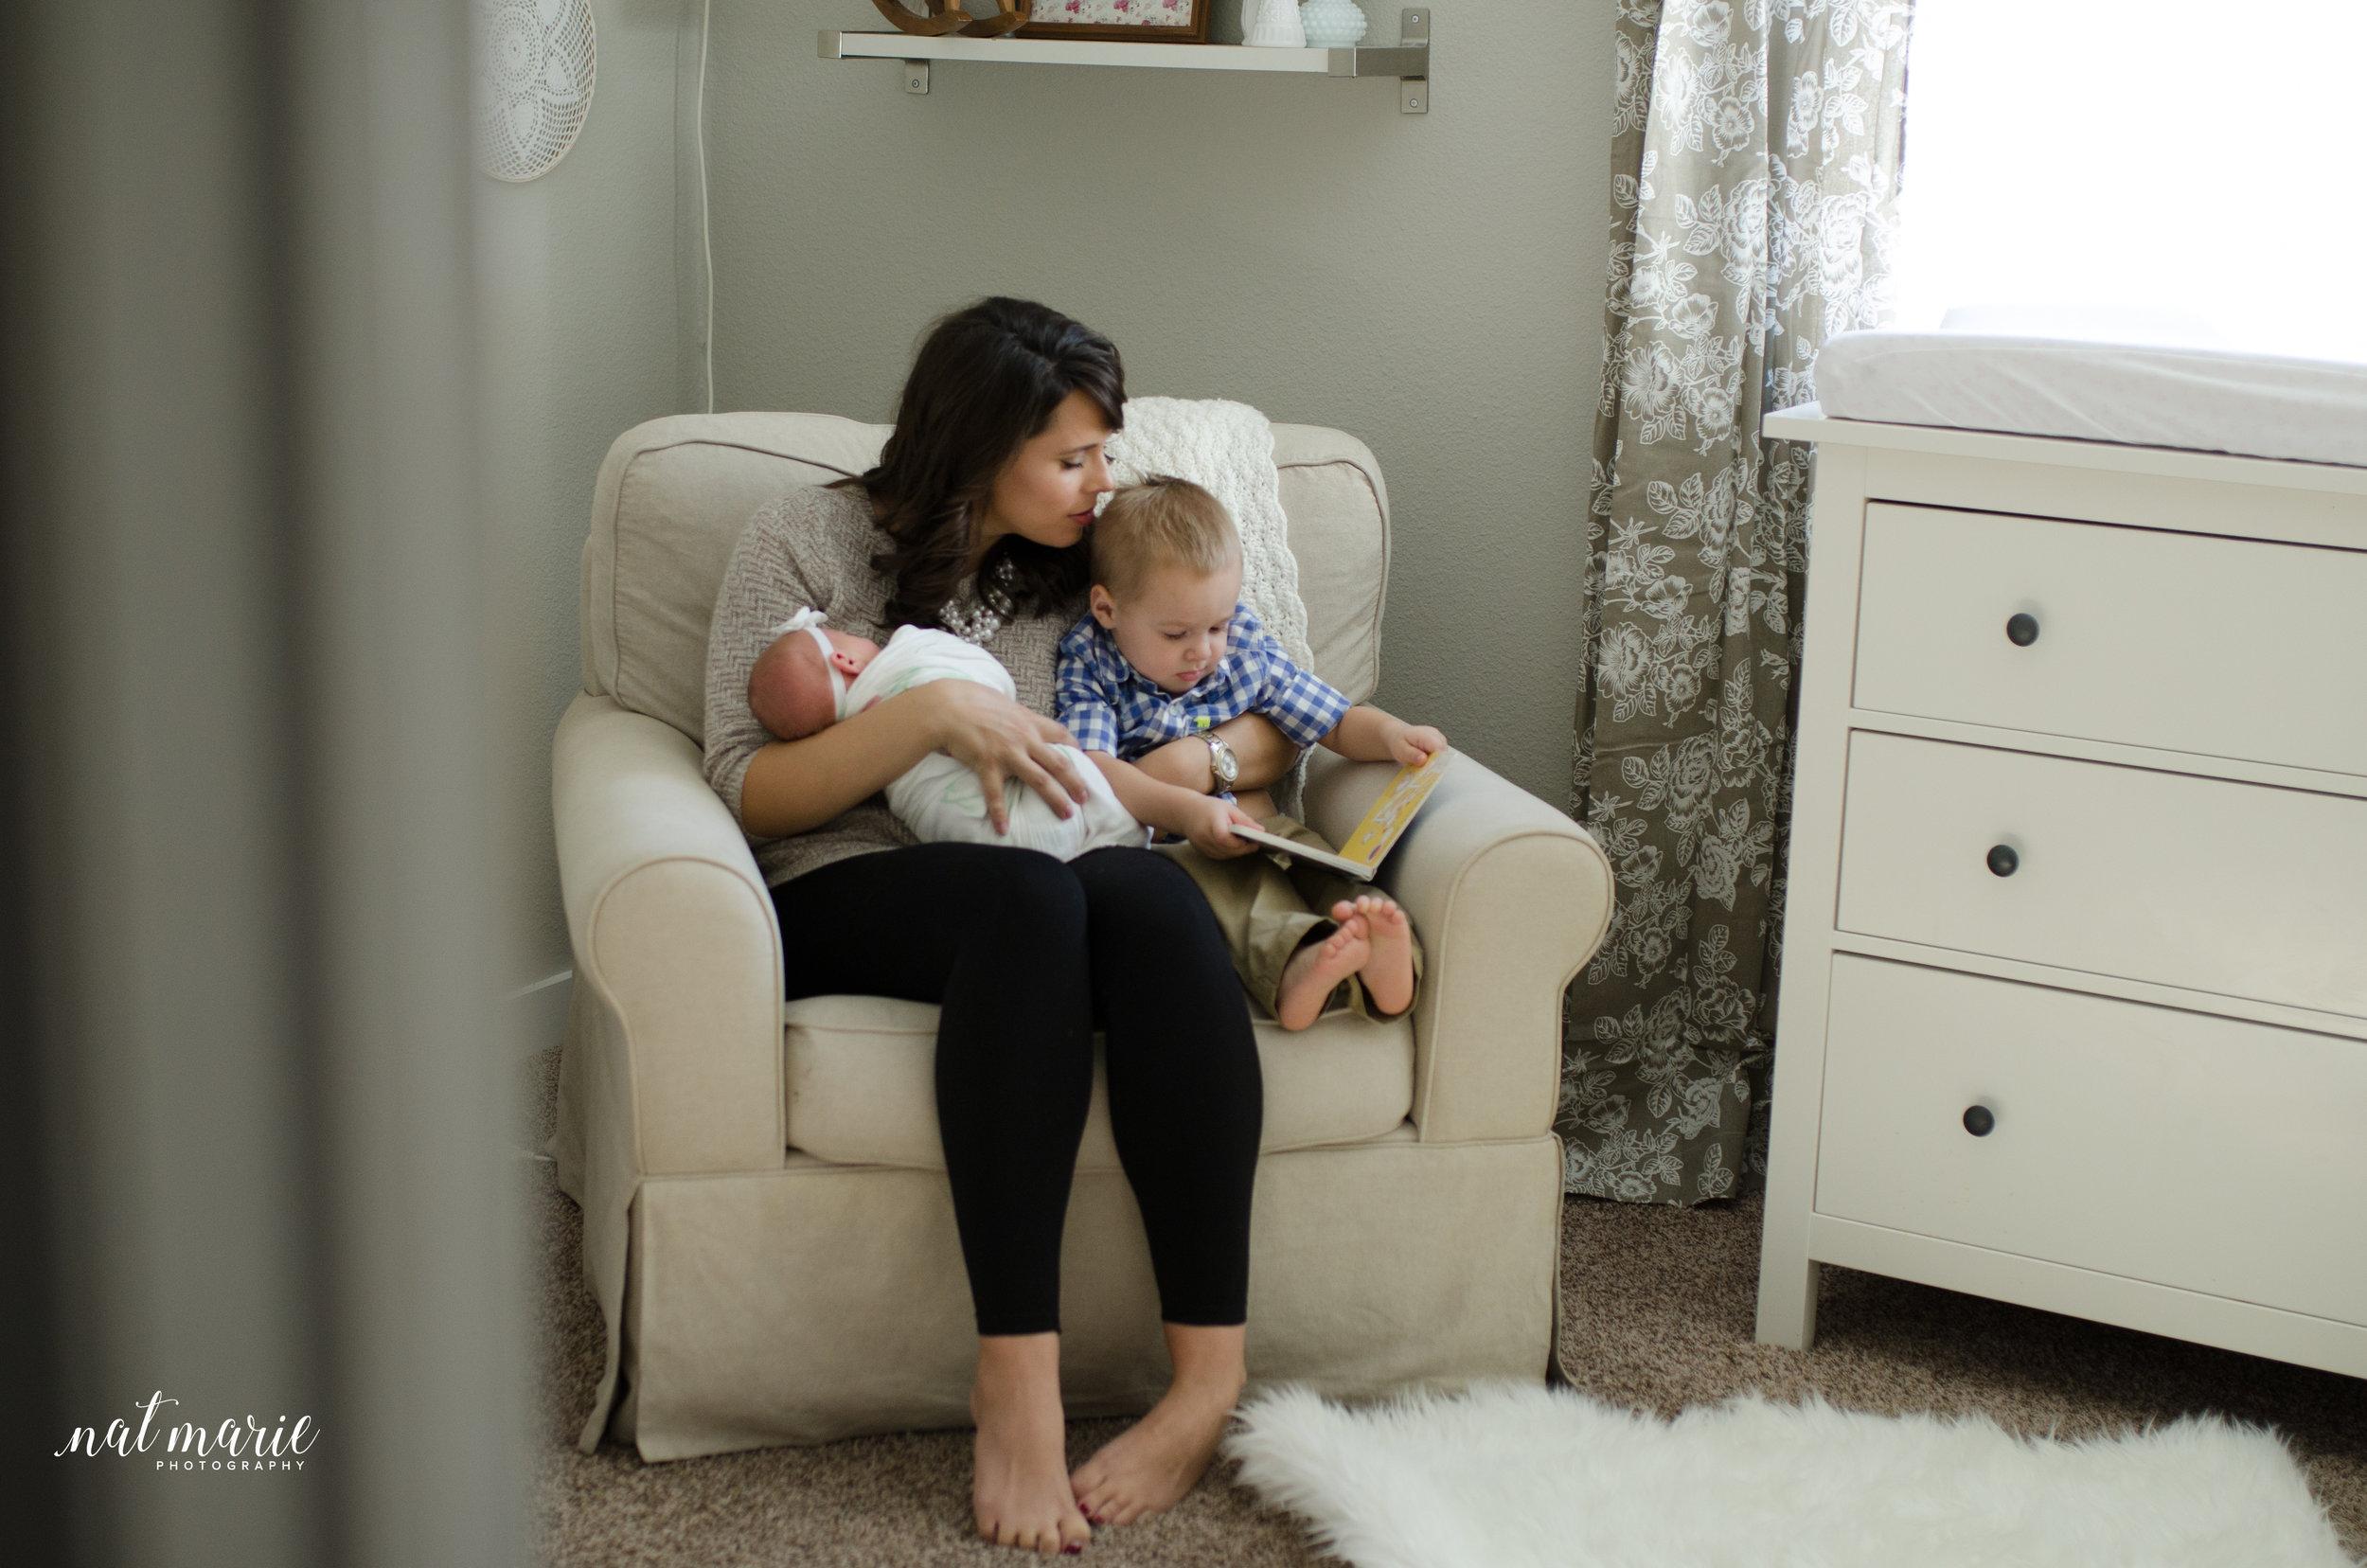 Scottsdale, AZ In-home Lifestyle Newborn Photographer - Light & Airy Photographer